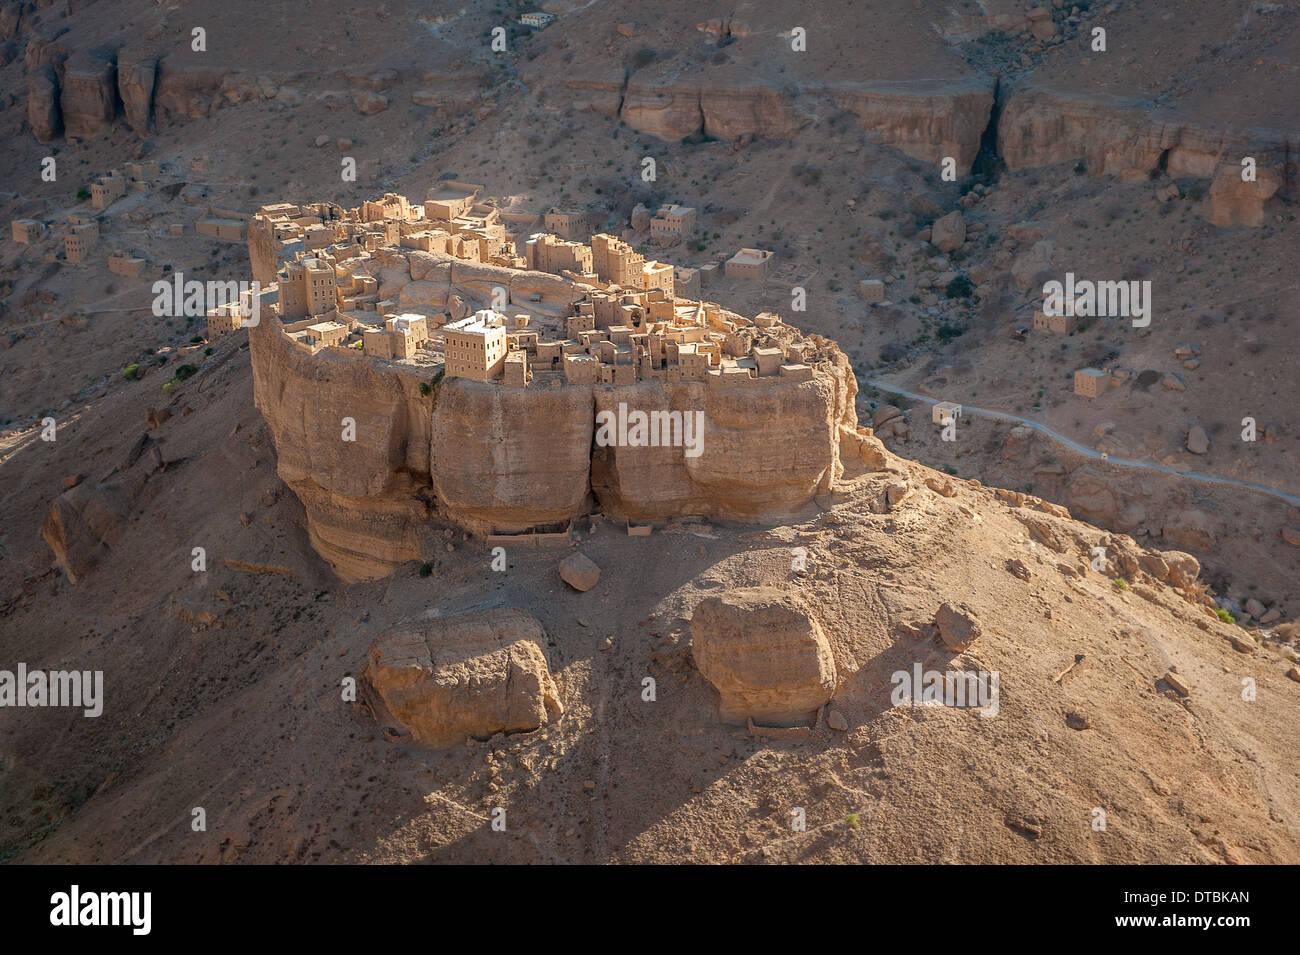 Panorama of Haid Al-Jazil in Wadi Doan, Hadramaut, Yemen - Stock Image